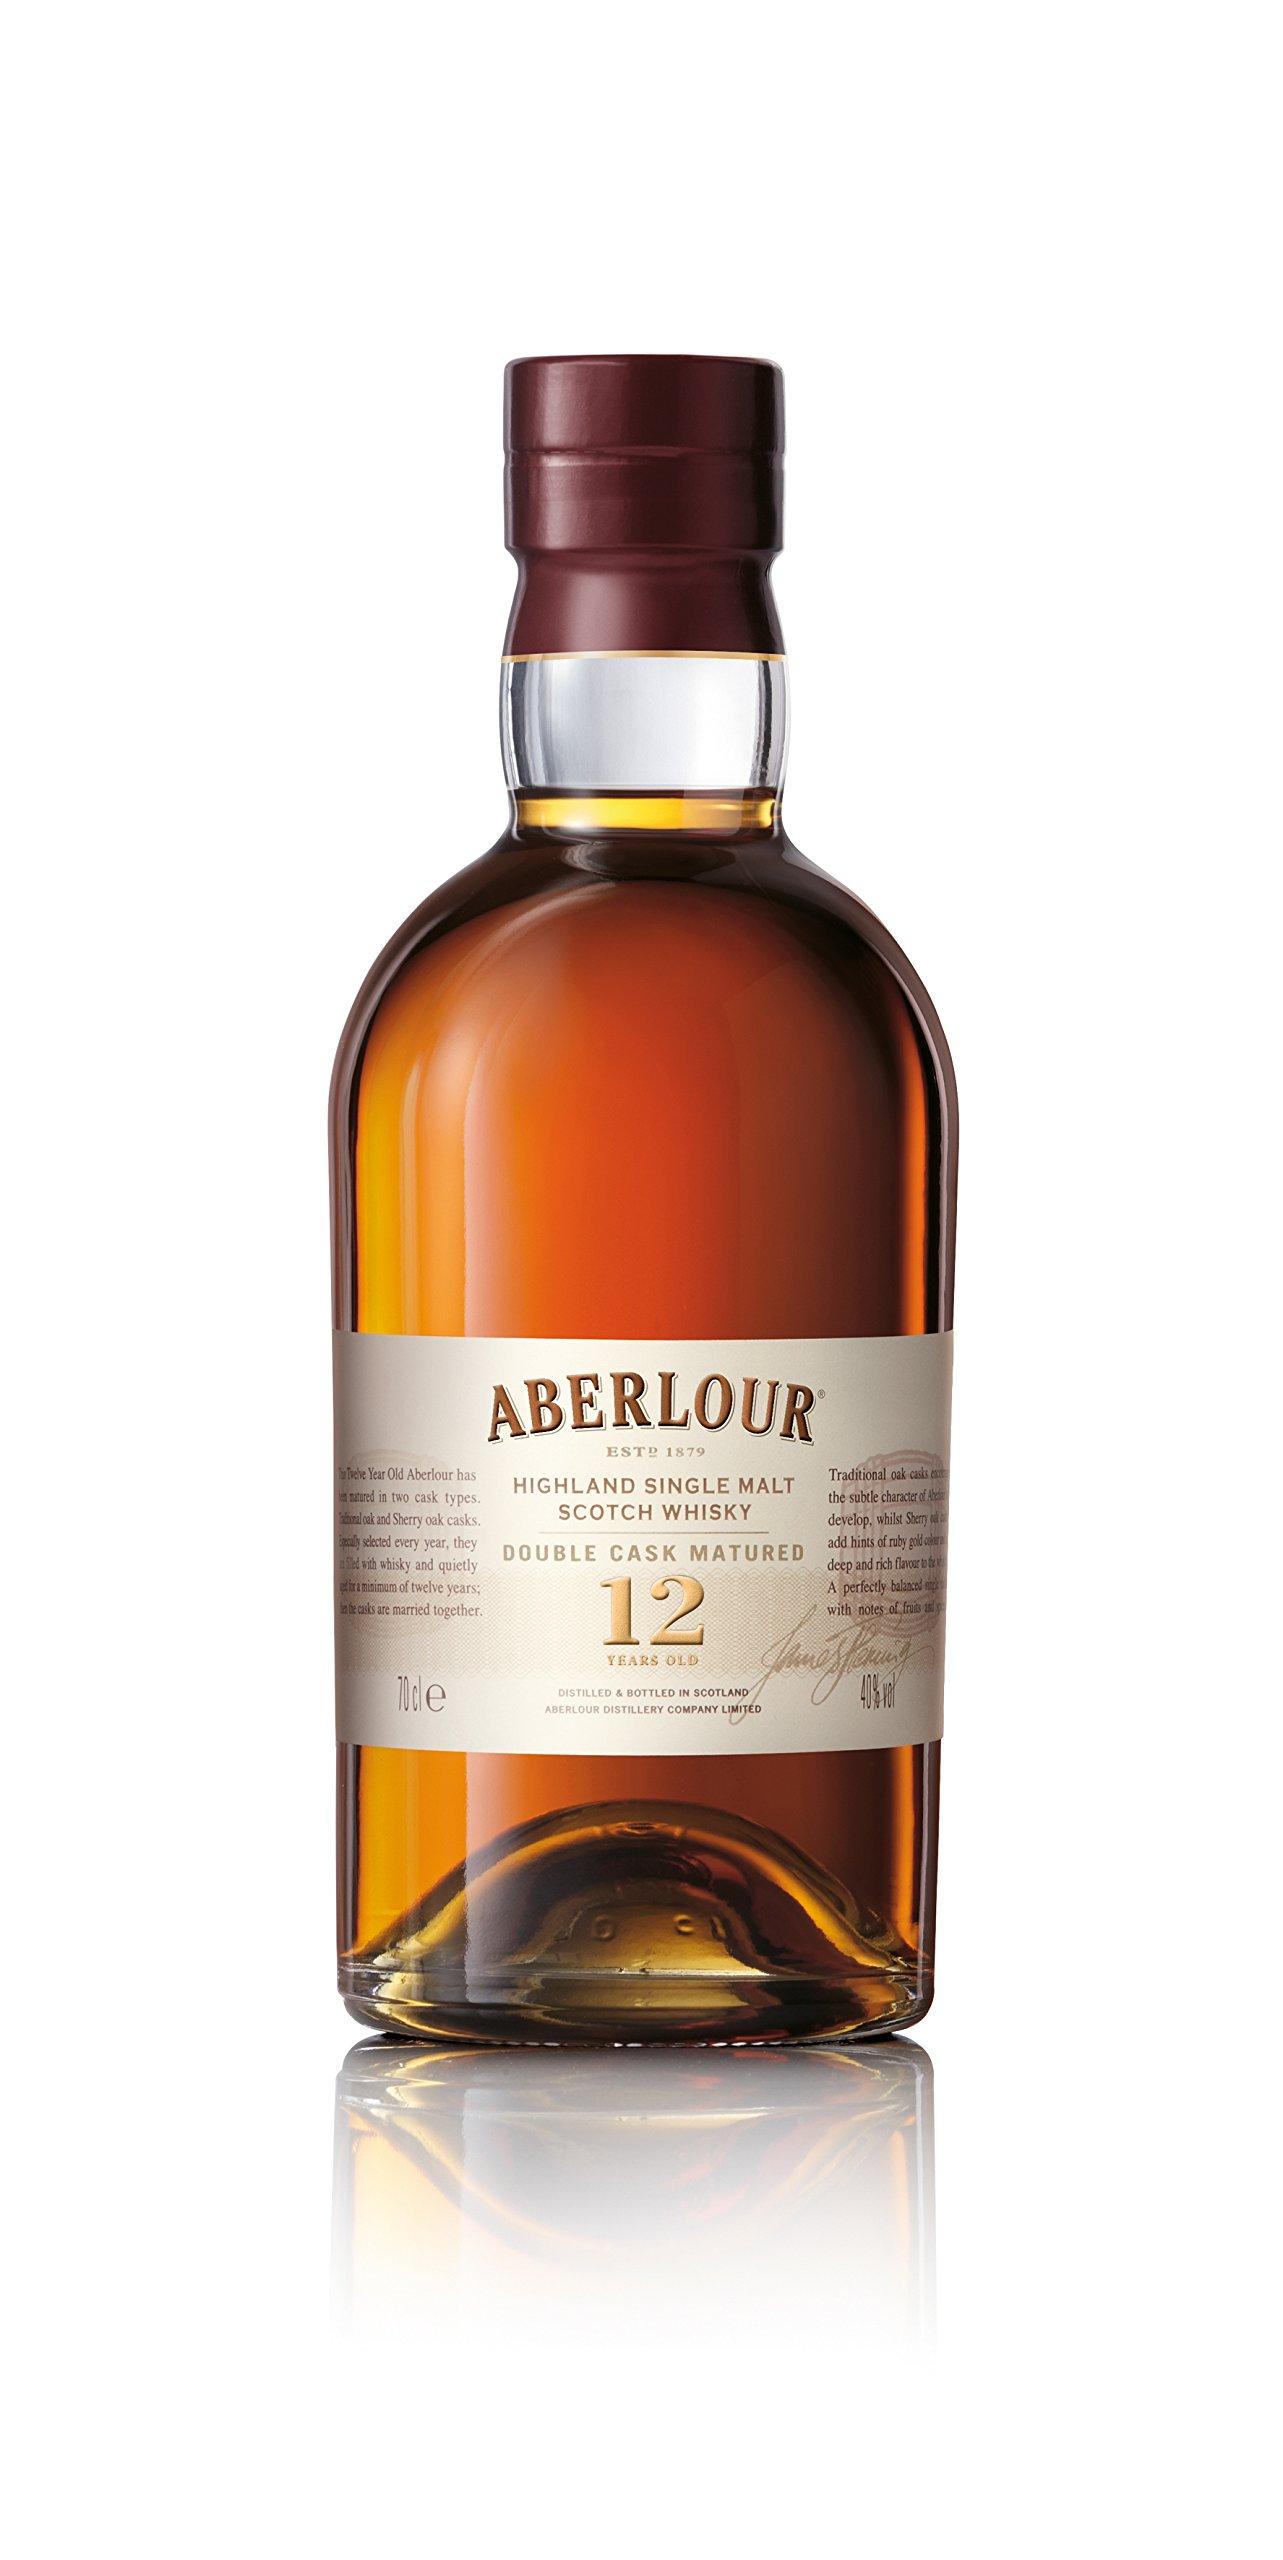 Aberlour-12-Jahre-Highland-Single-Malt-Scotch-Whisky–Double-Cask-Matured-Scotch-Single-Malt-Whisky–1-x-07-L